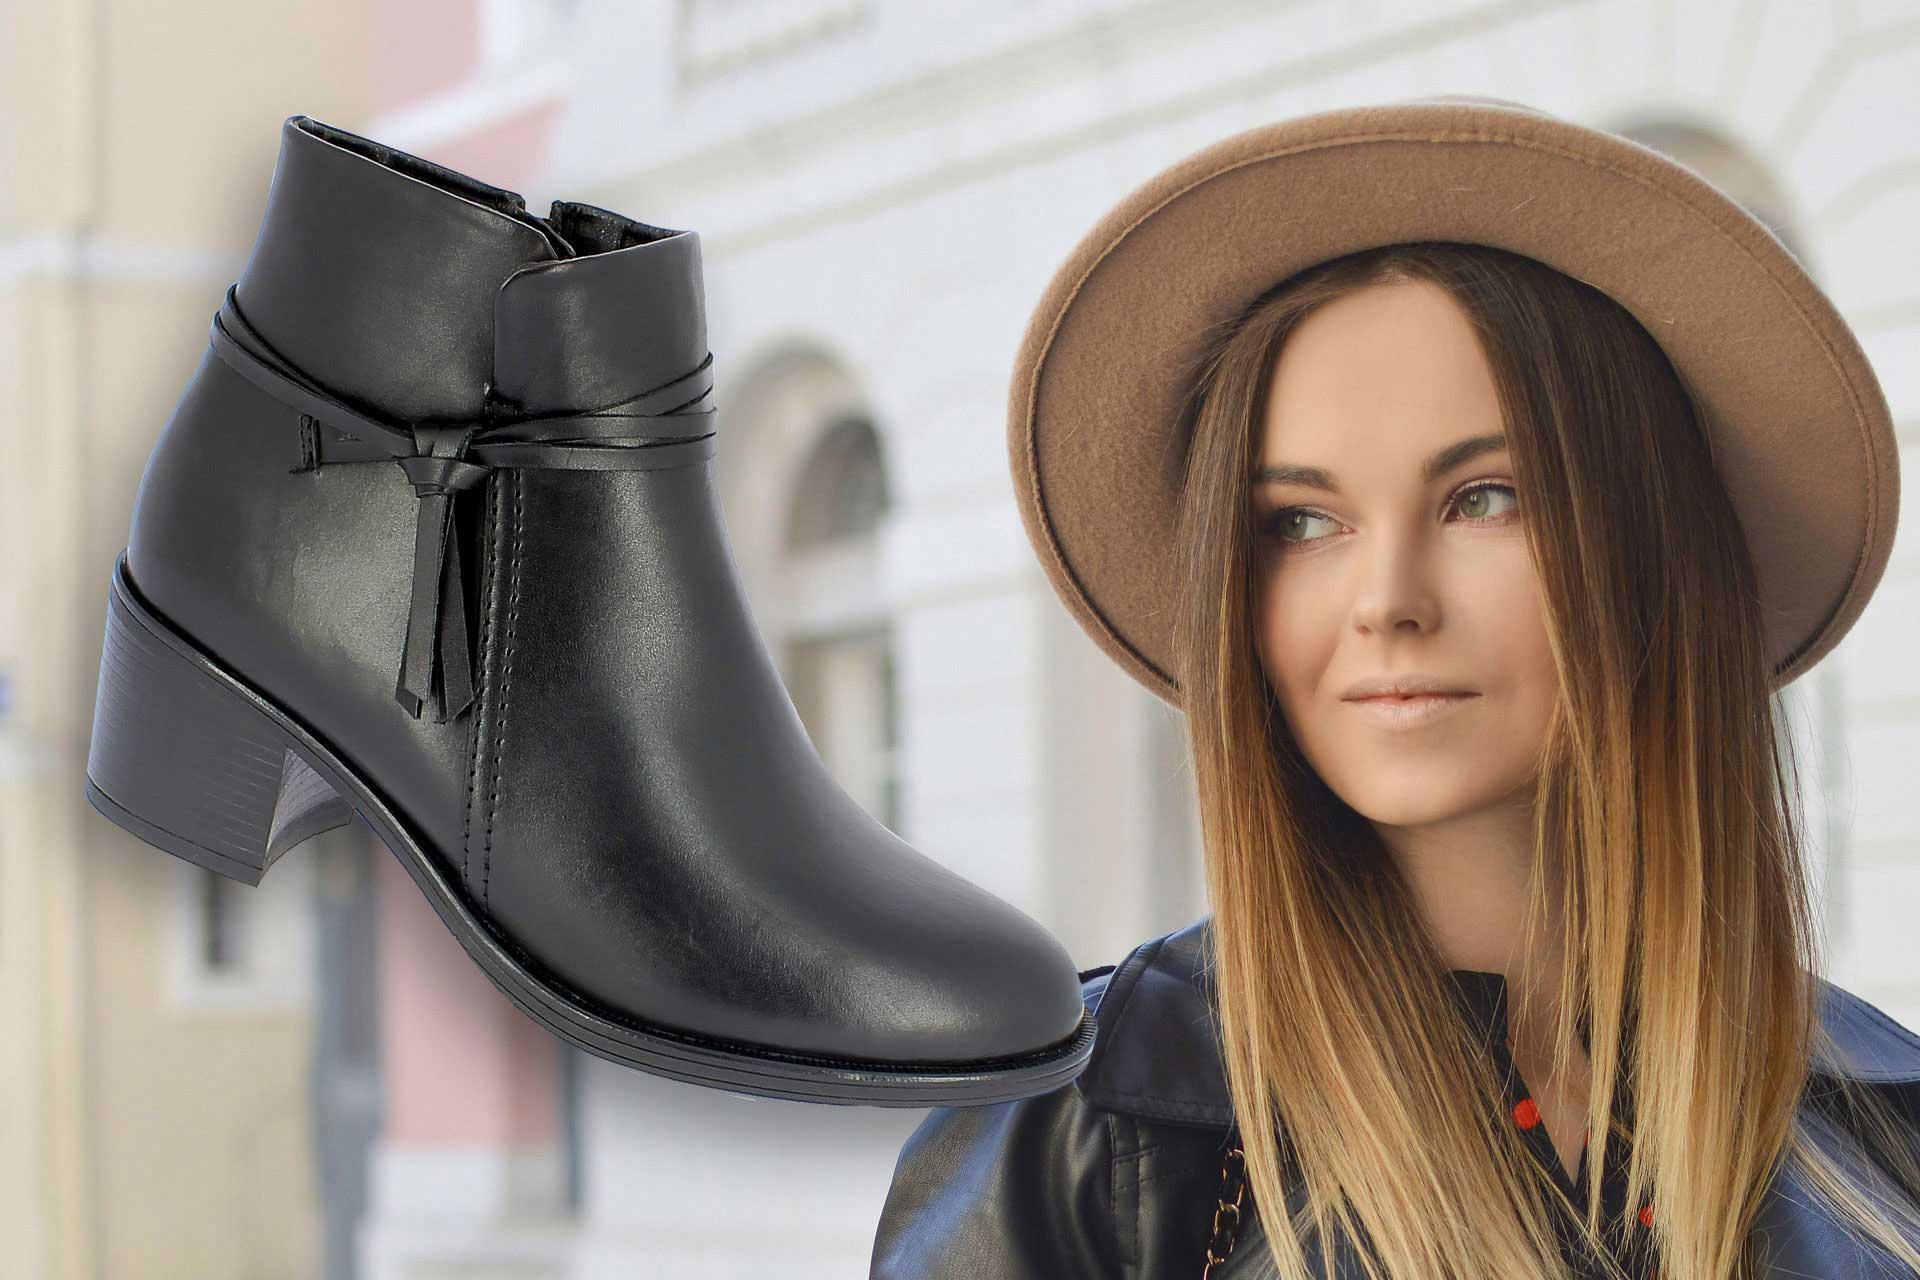 Barletta Ciabatte Pantofole Bt Calzature Sandali Michelle 8wOk0XnP